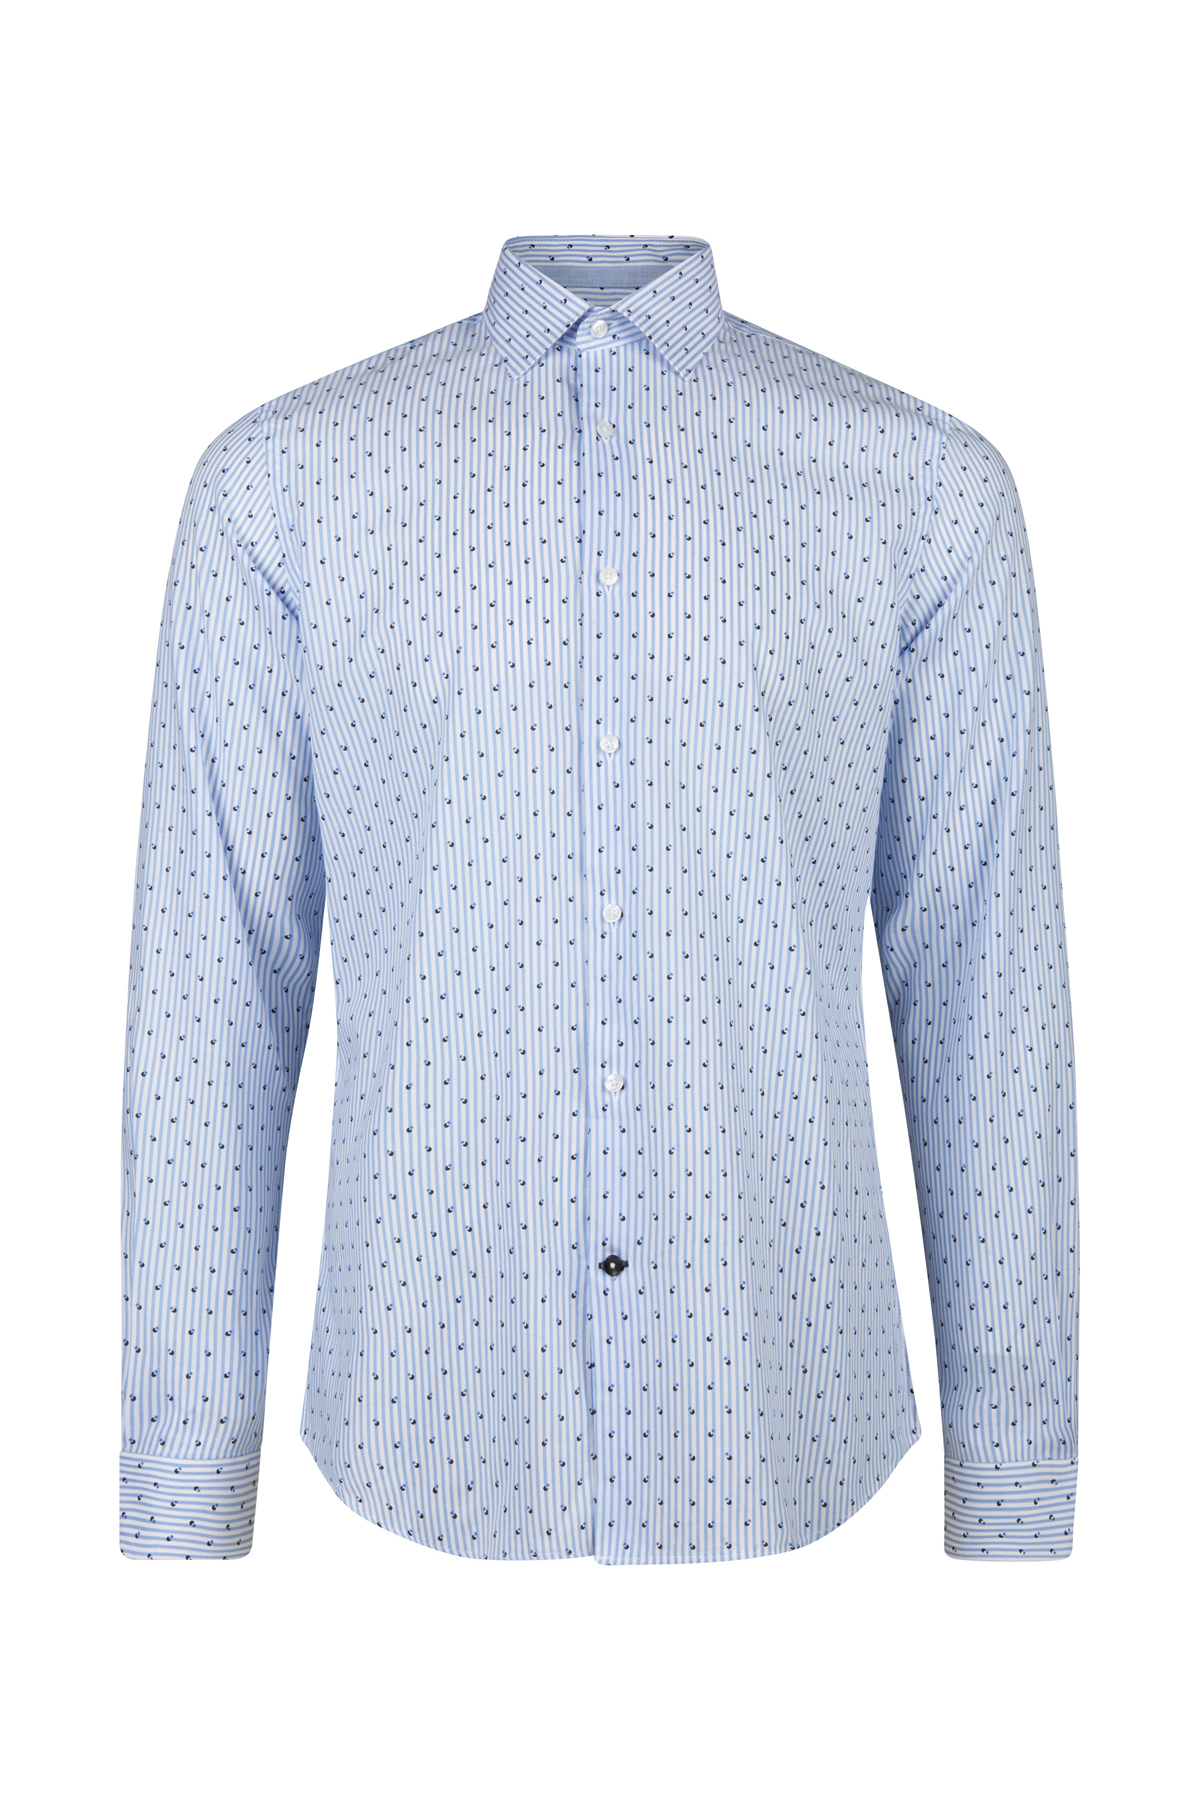 Overhemd Blauw.Heren Slim Fit Gestreept Overhemd 93801478 We Fashion